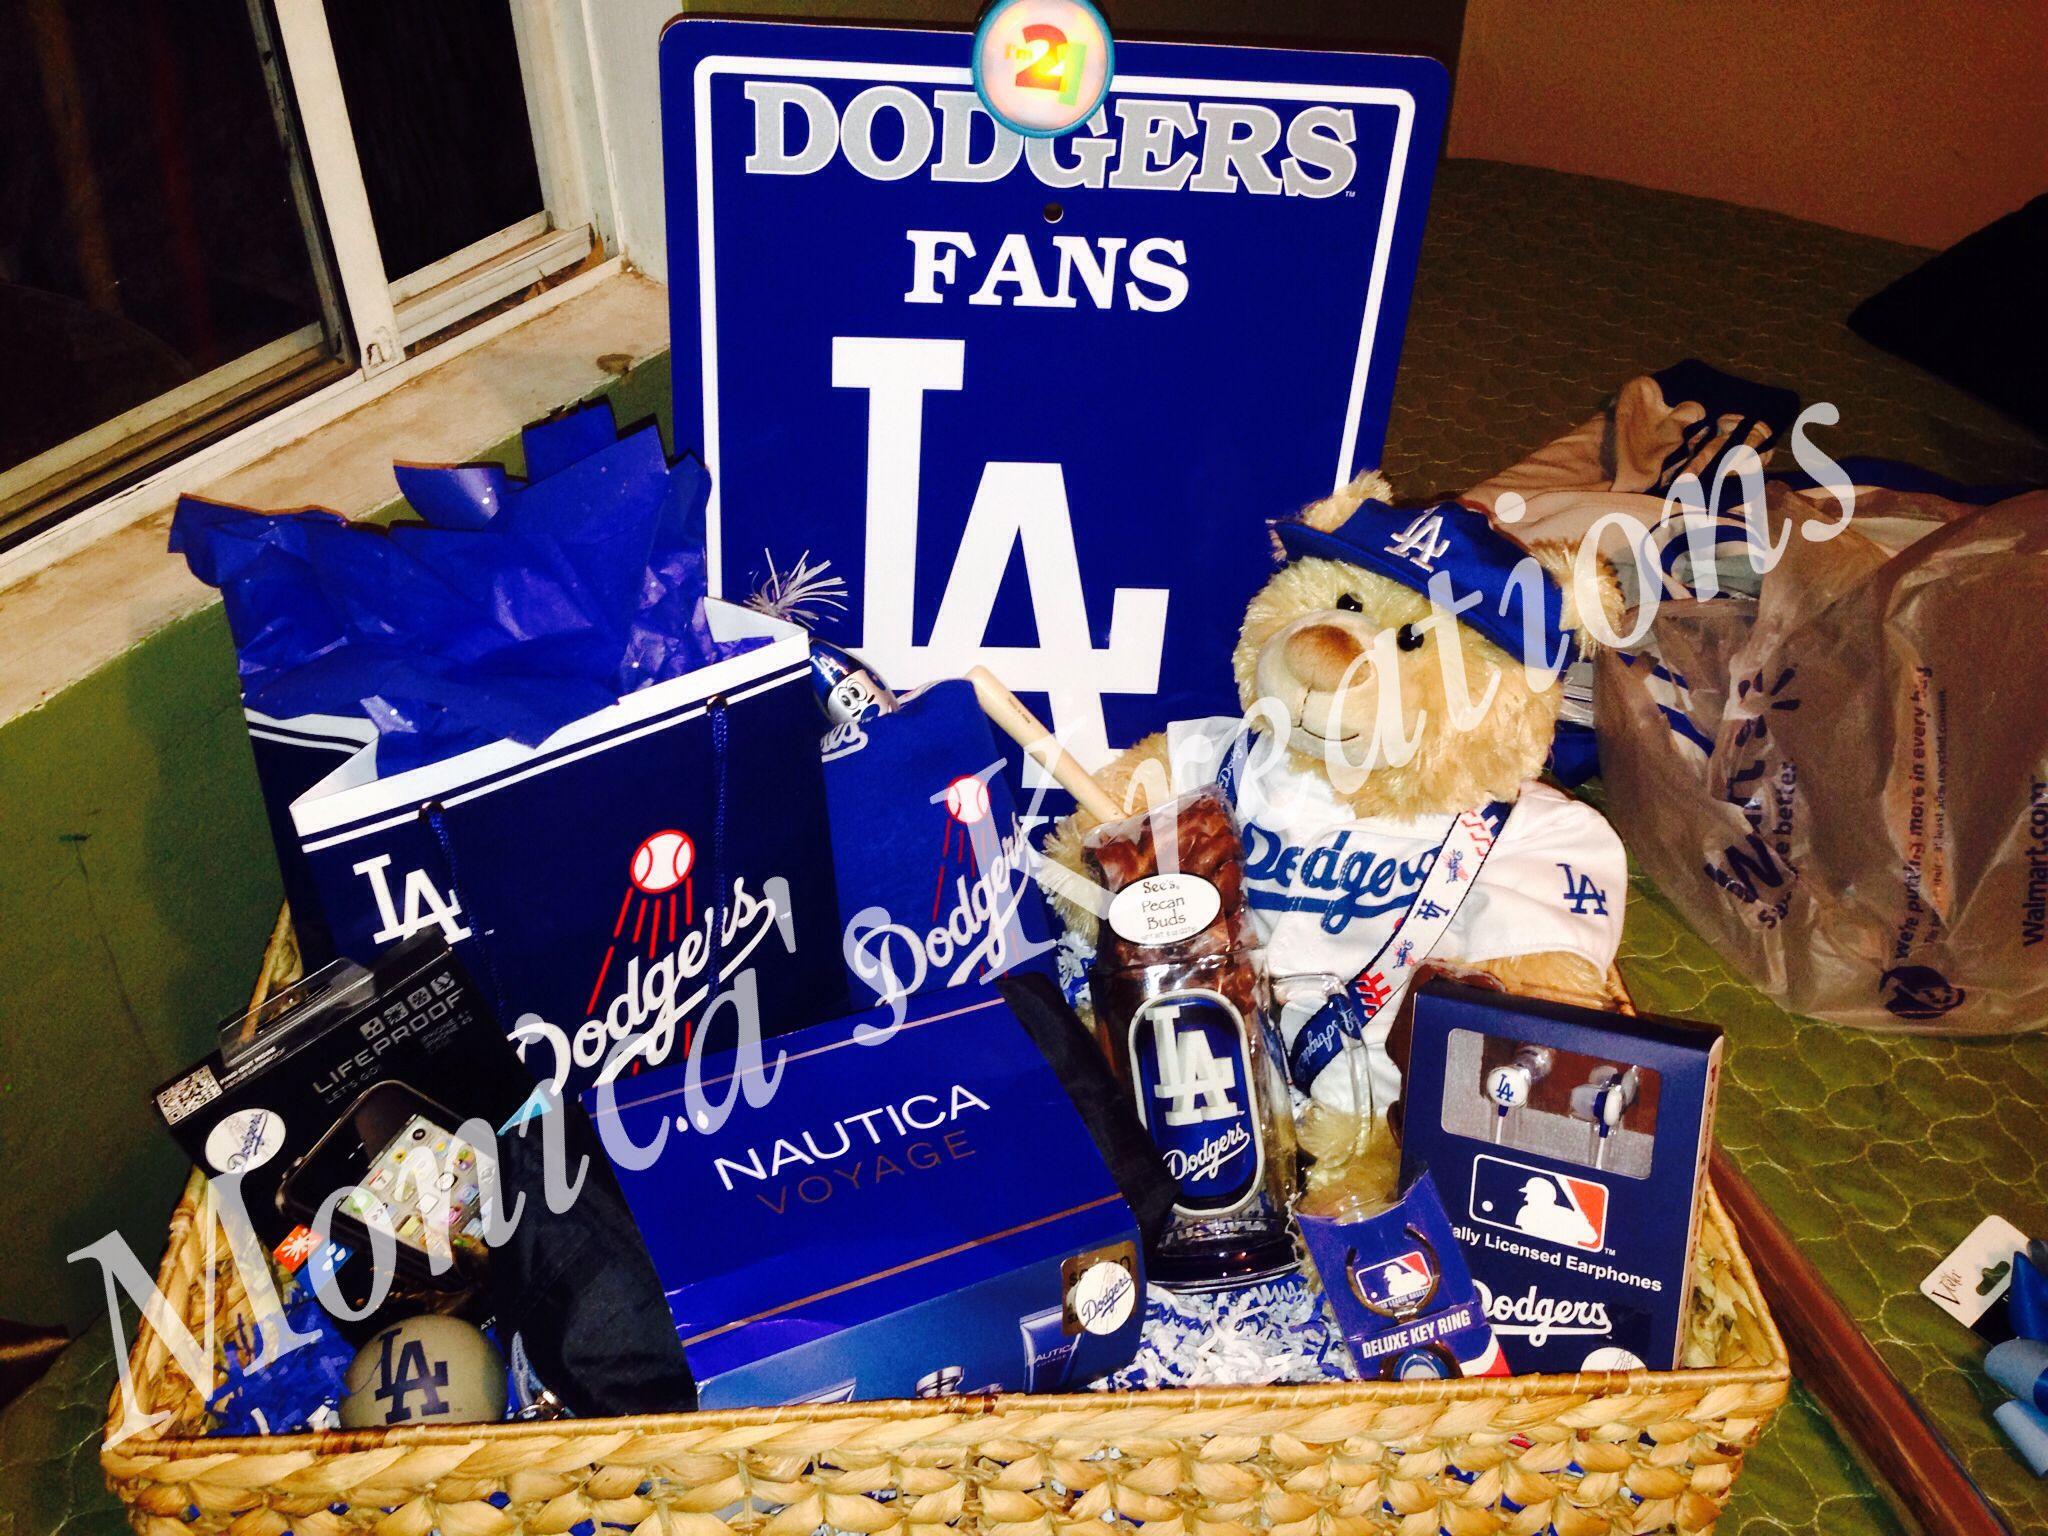 Dodgers fan appreciation prizes for adults